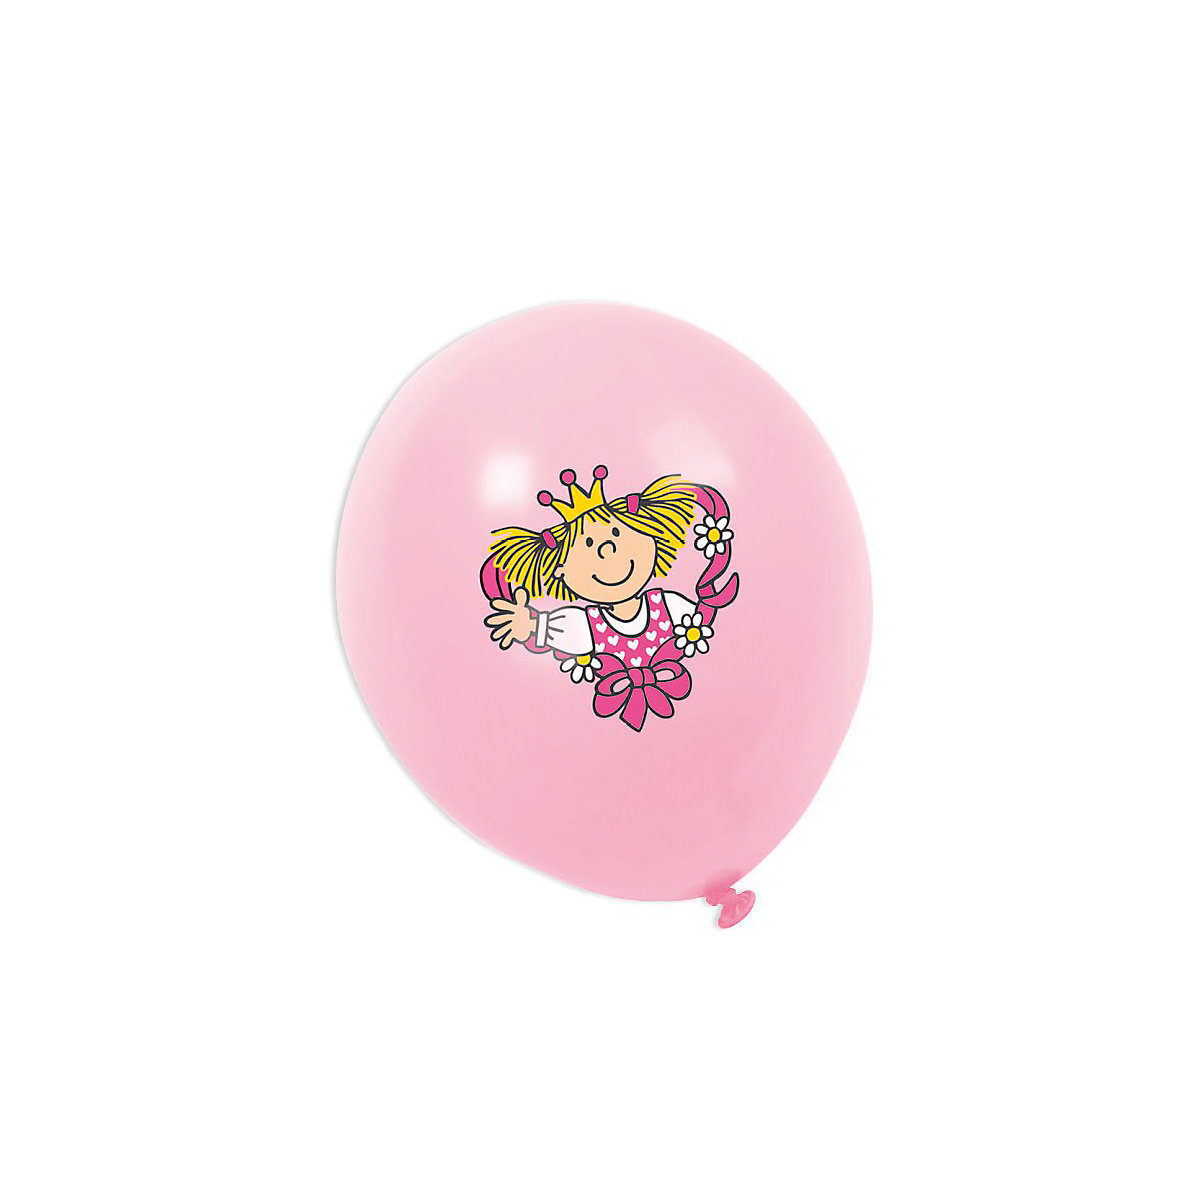 Lutz Gartenmoebel Sonnenschirme: Luftballons Prinzessin Miabella, 8 Stück, Rosa, Lutz